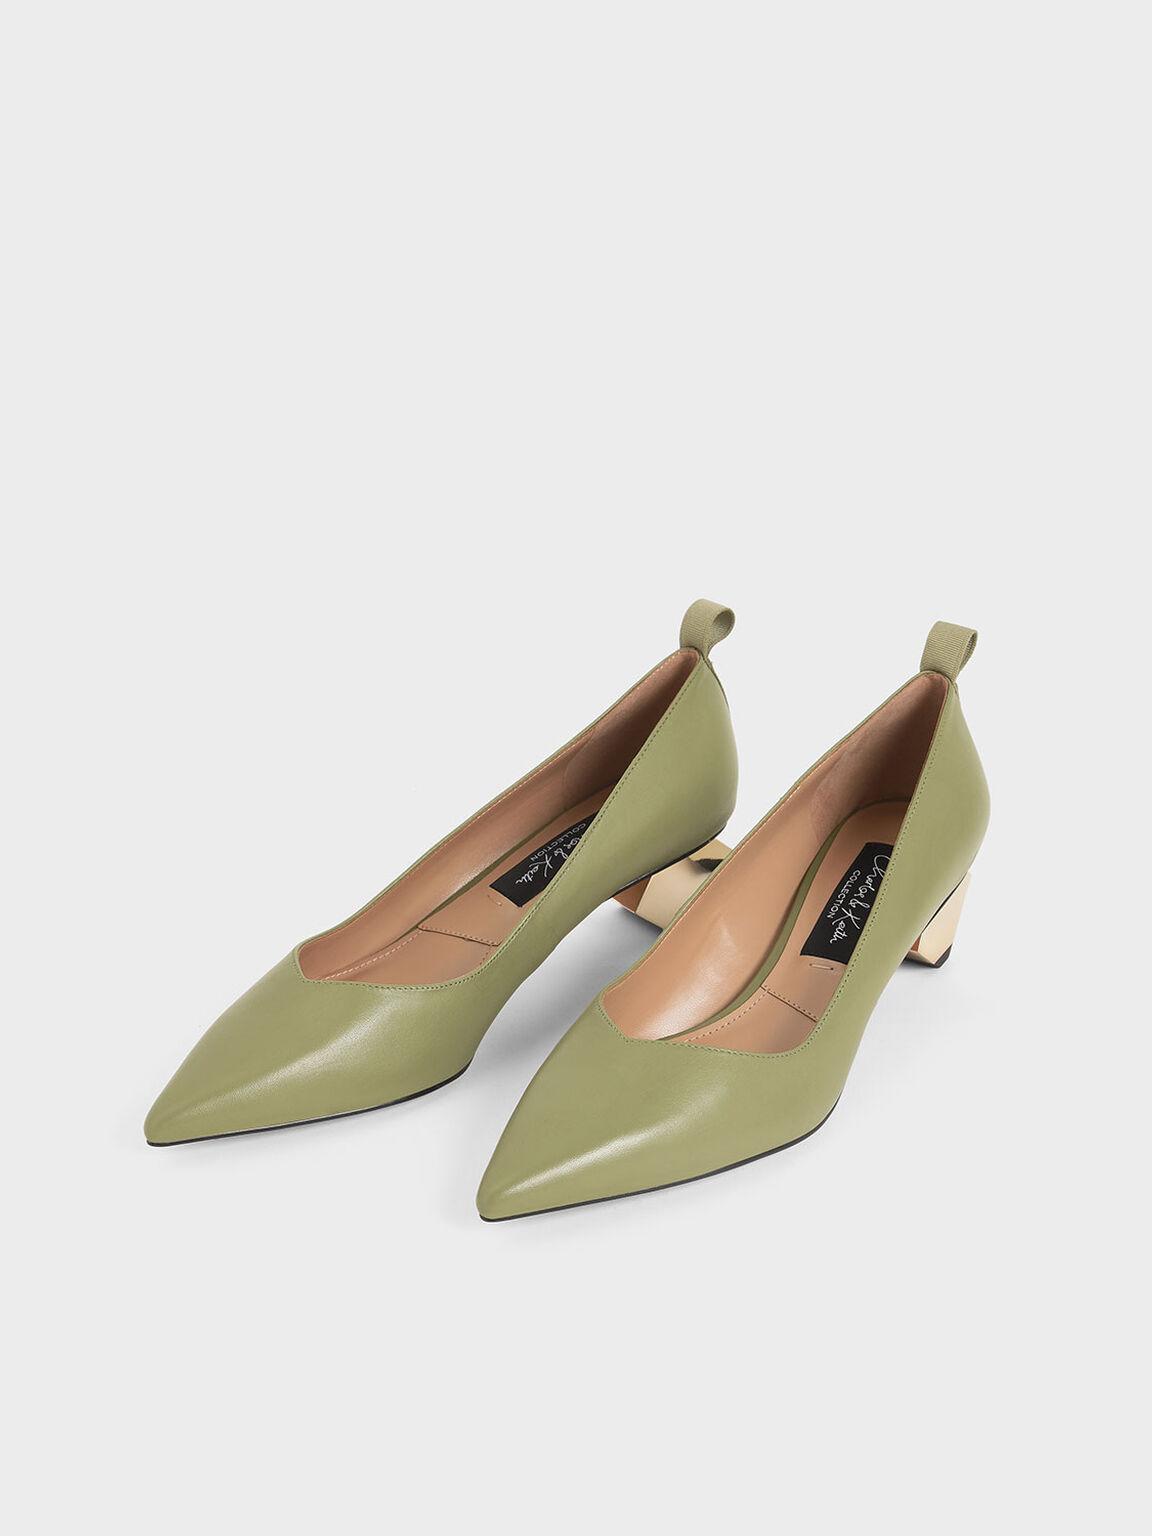 Leather Sculptural Heel Pumps, Sage Green, hi-res